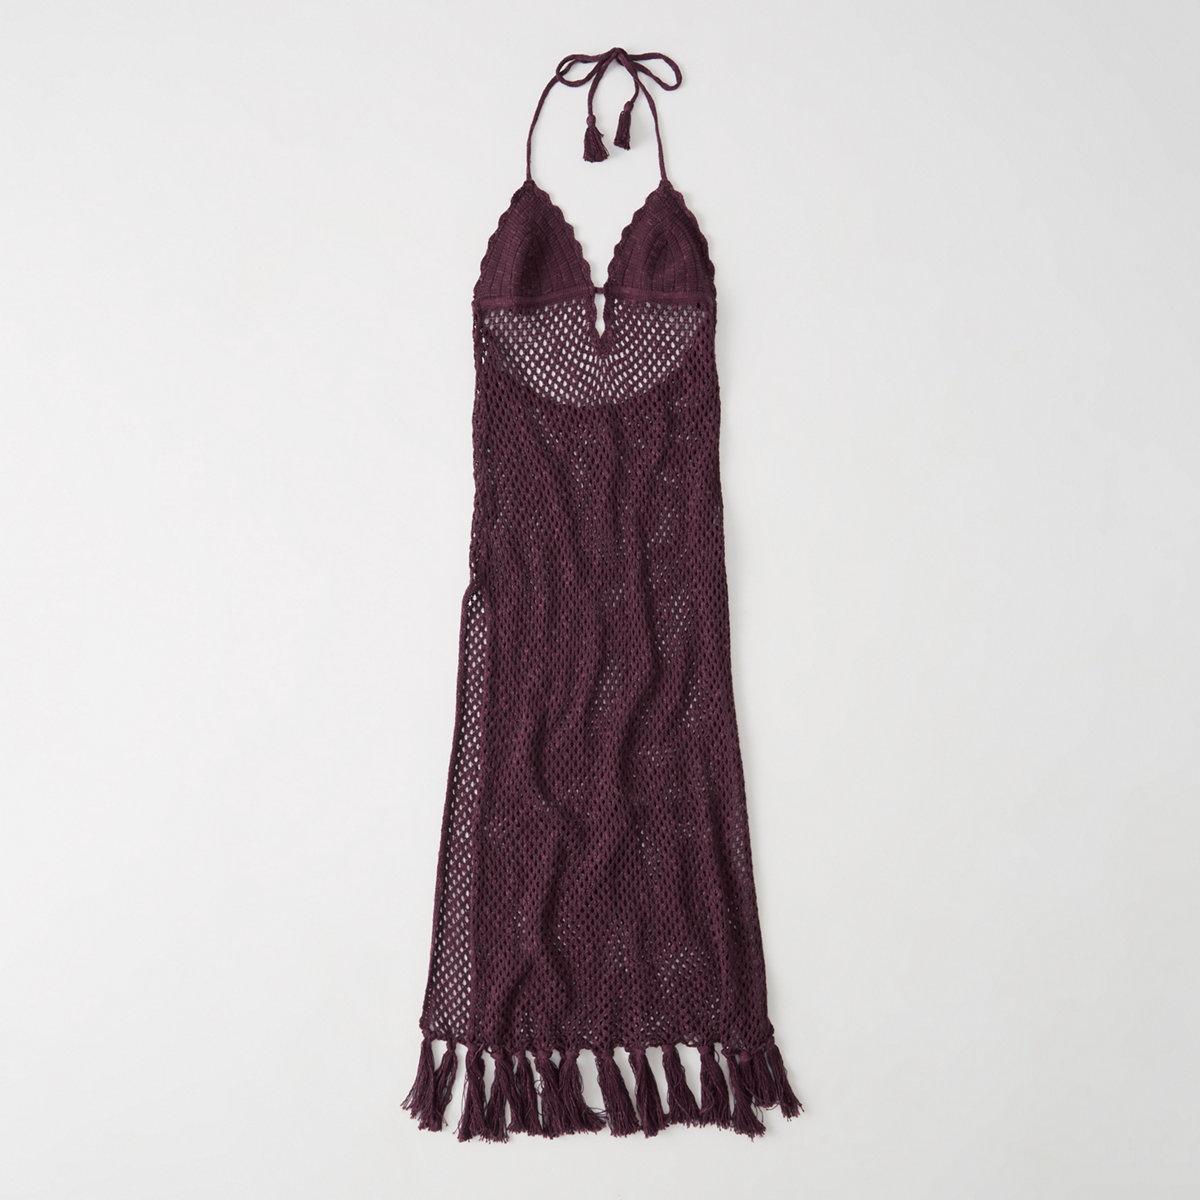 Crochet Maxi Cover-Up